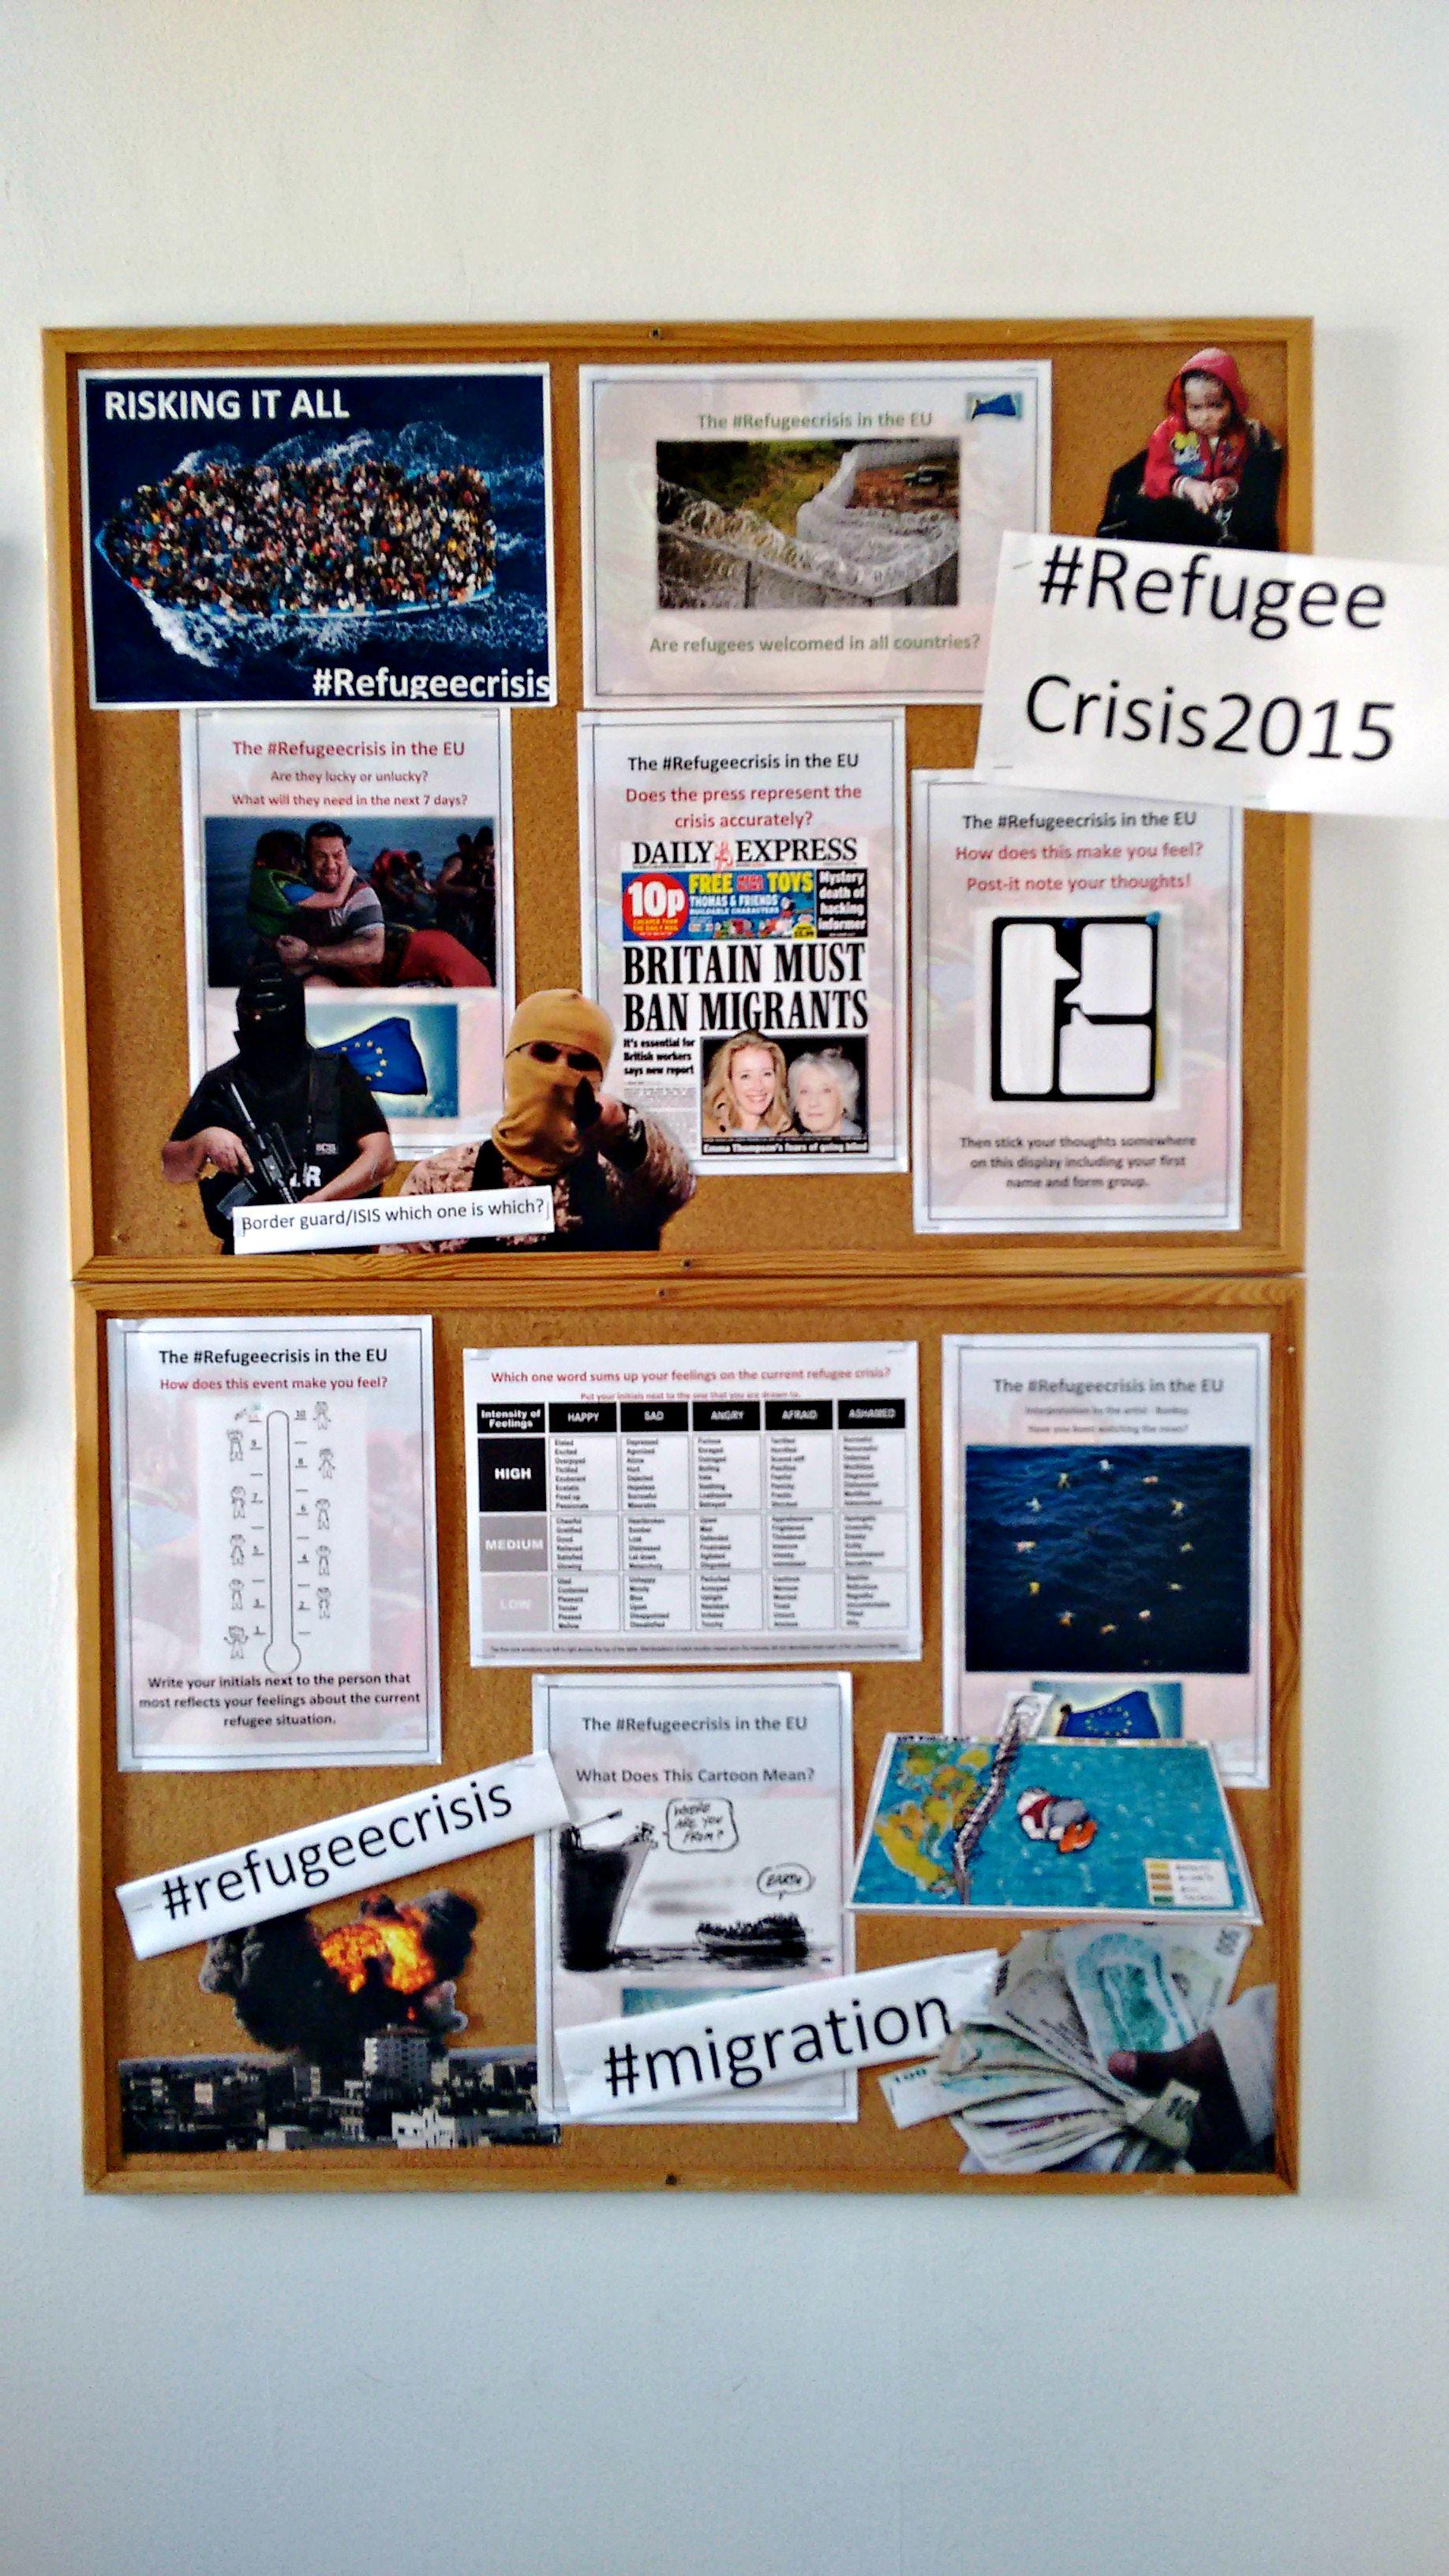 Poster design ks3 - Ks3 Students Explore The History Of The Refugee Crisis International British School Of Bucharest